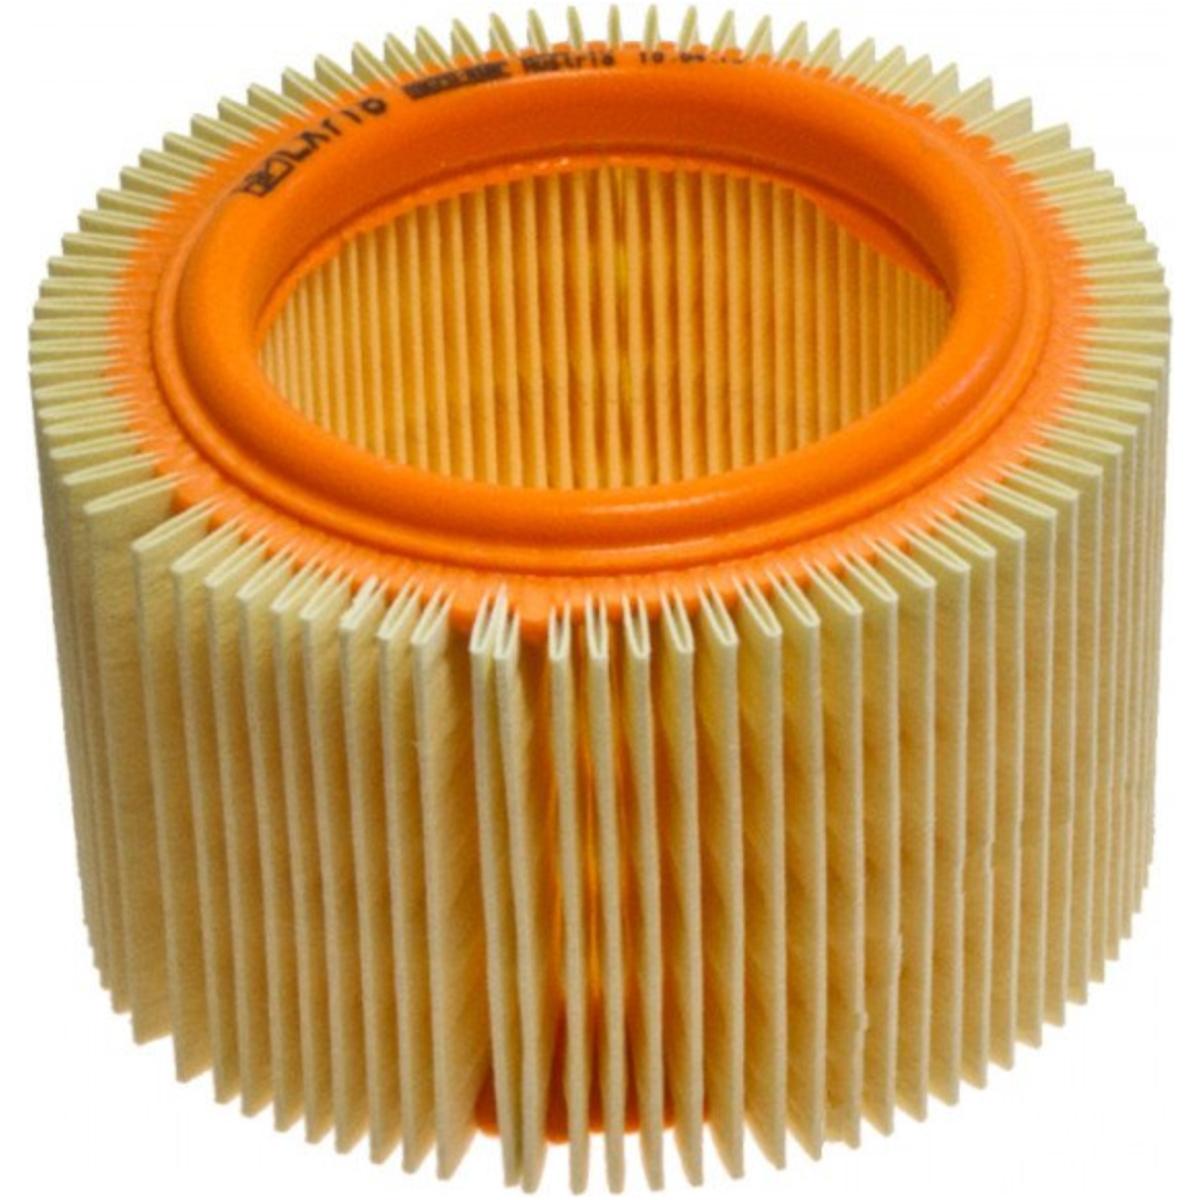 Air filter mahle LX718 - 9,40 EUR